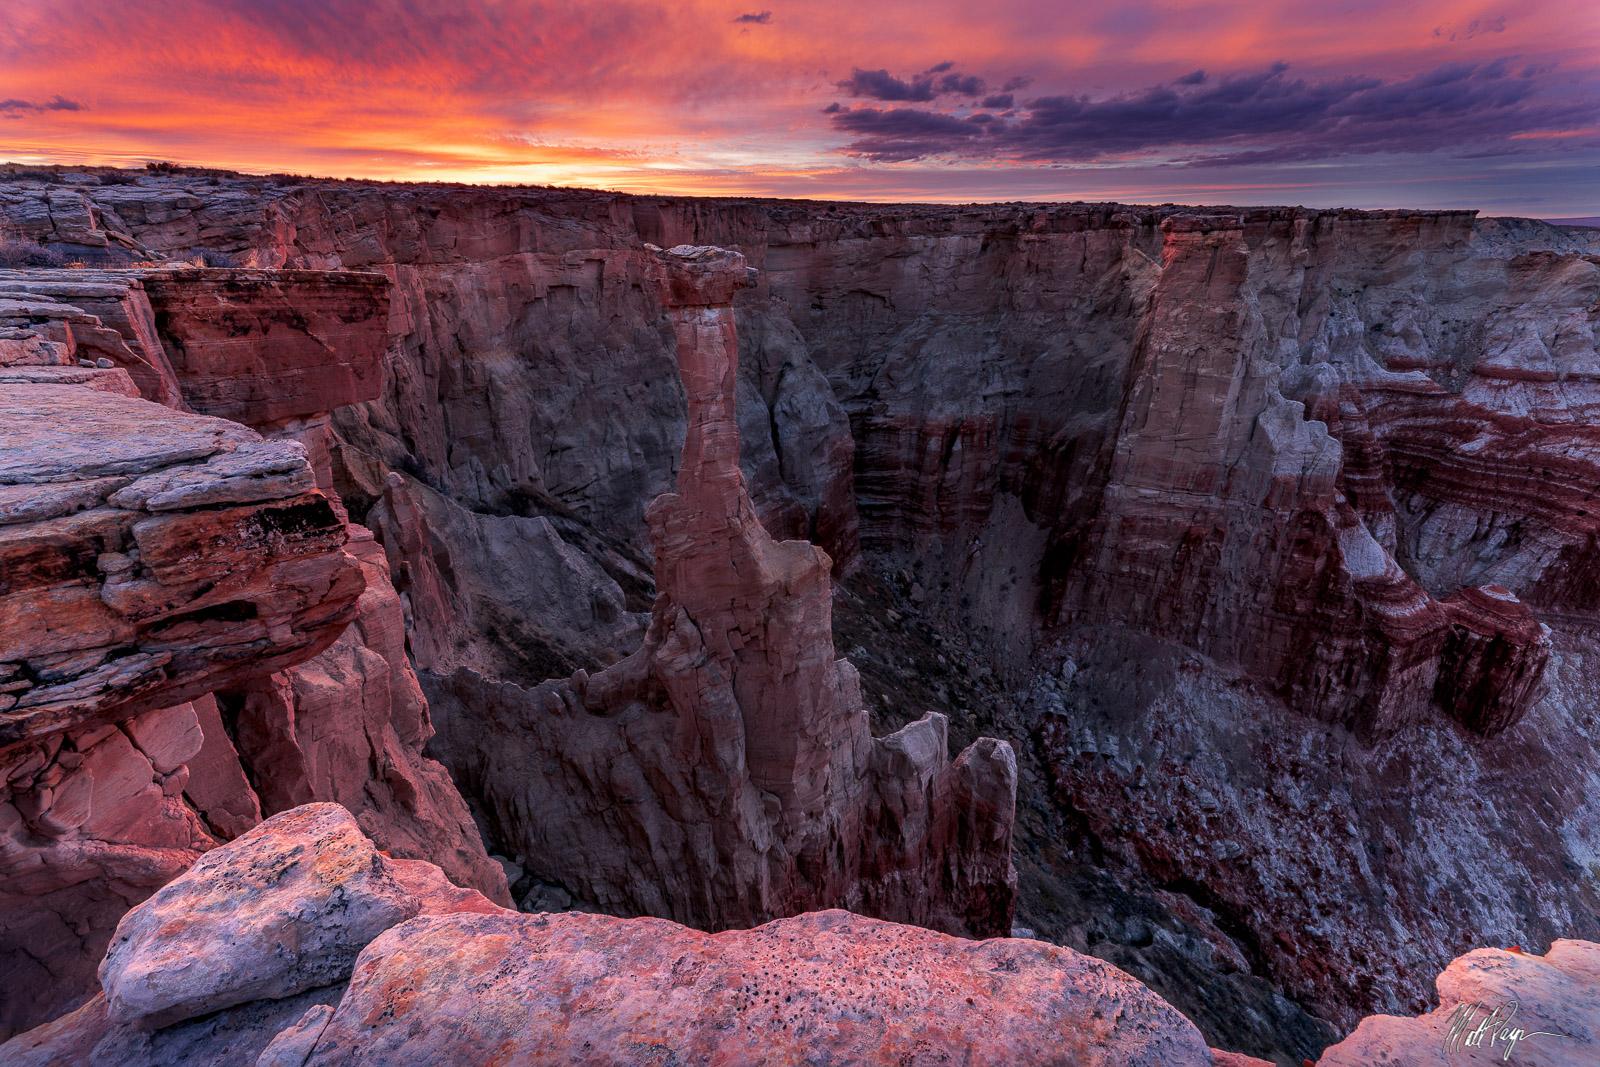 Desert Southwest, Clouds, Hoodoo, Landscape, Sunset, bounce light, canyon, vibrant, photo